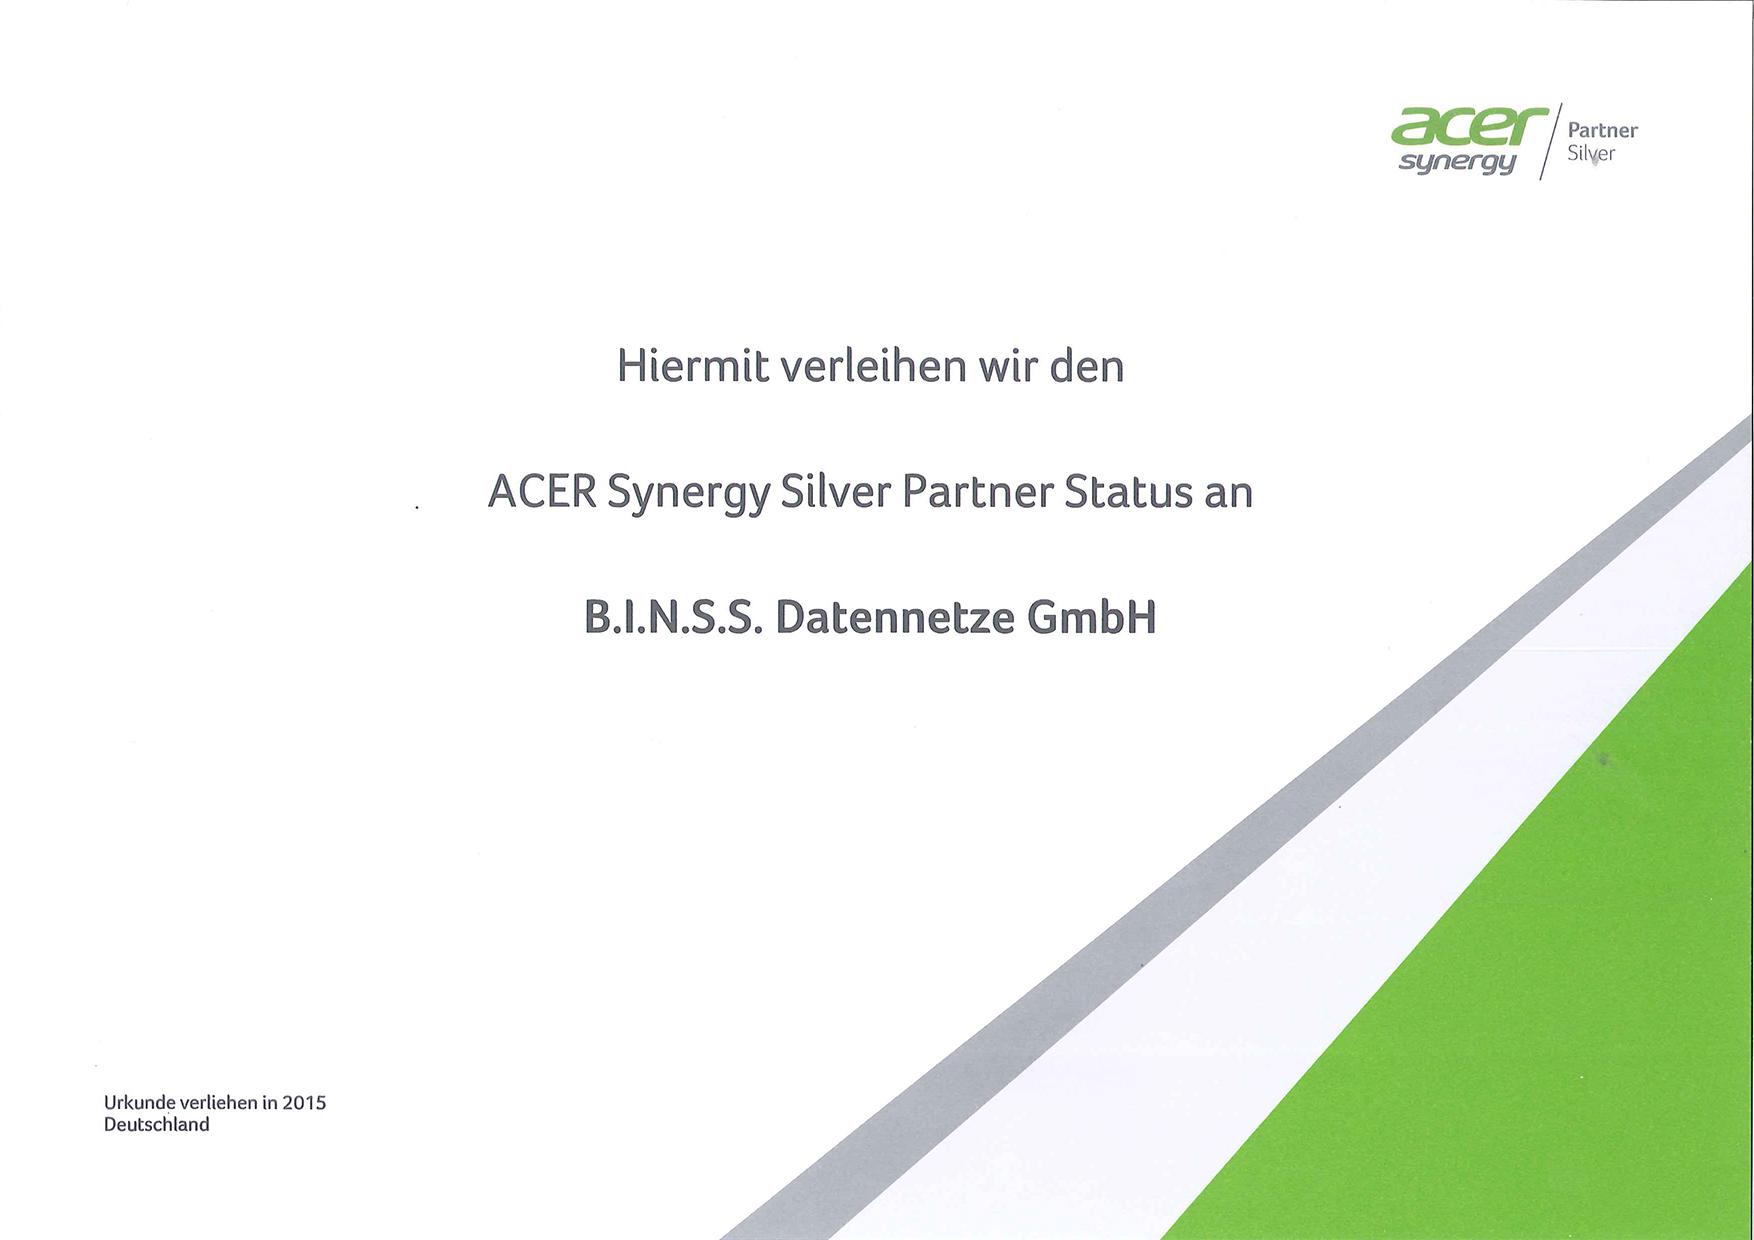 Acer Synergy Silver Partner